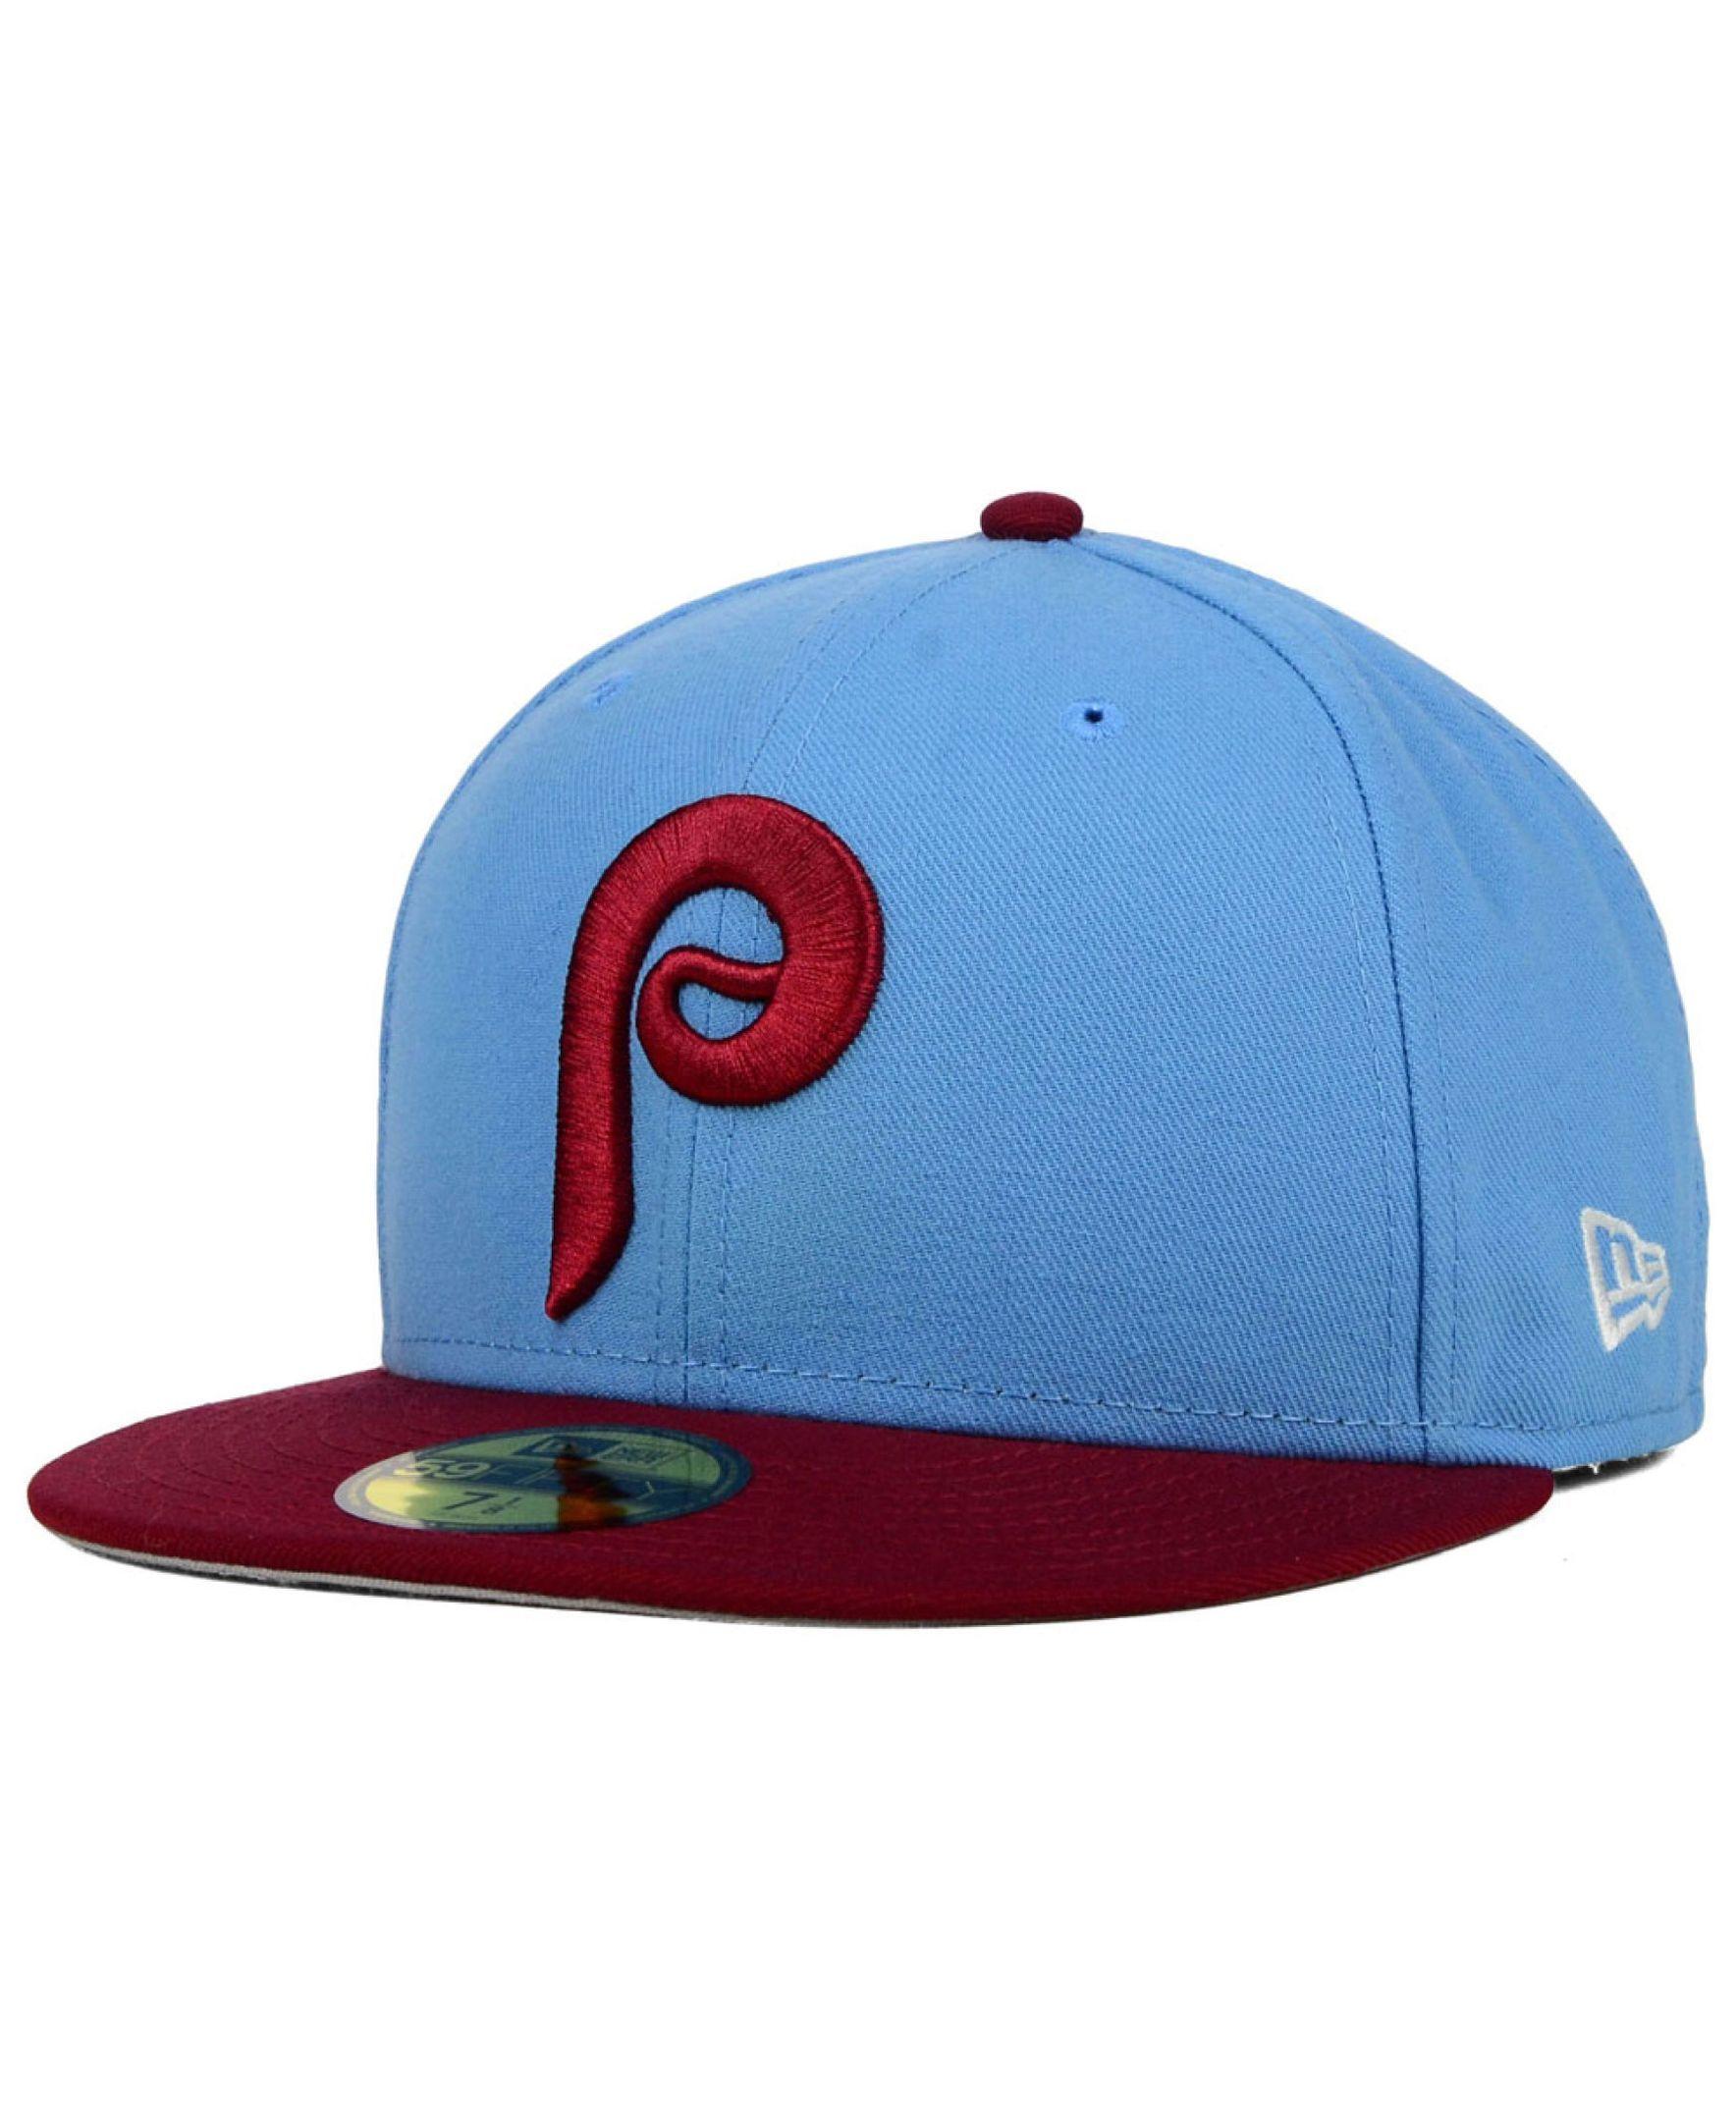 New Era Philadelphia Phillies Cooperstown 2-Tone 59FIFTY Cap ... 52f65e42928